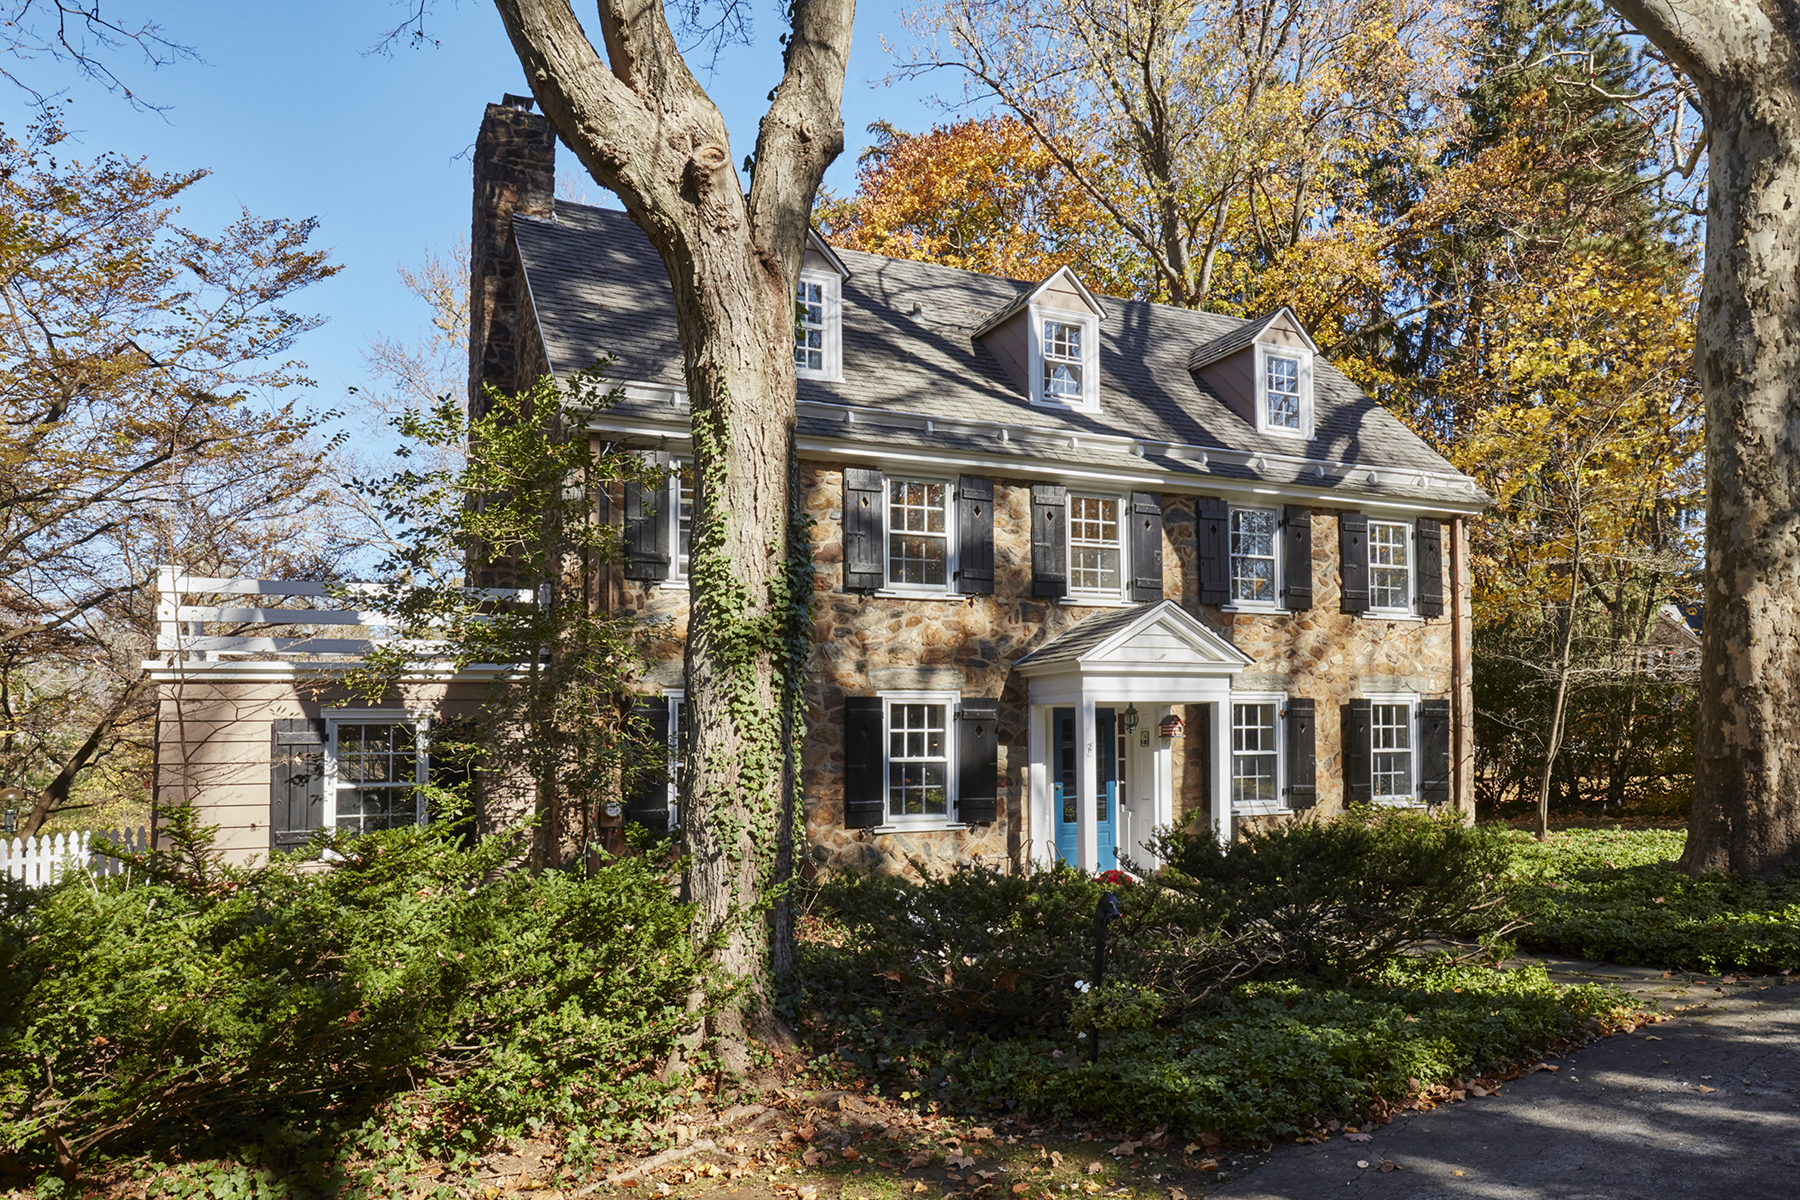 Single Family Home for Sale at Main Line Stone Manor Home 774 Harrison Road Villanova, Pennsylvania 19085 United States